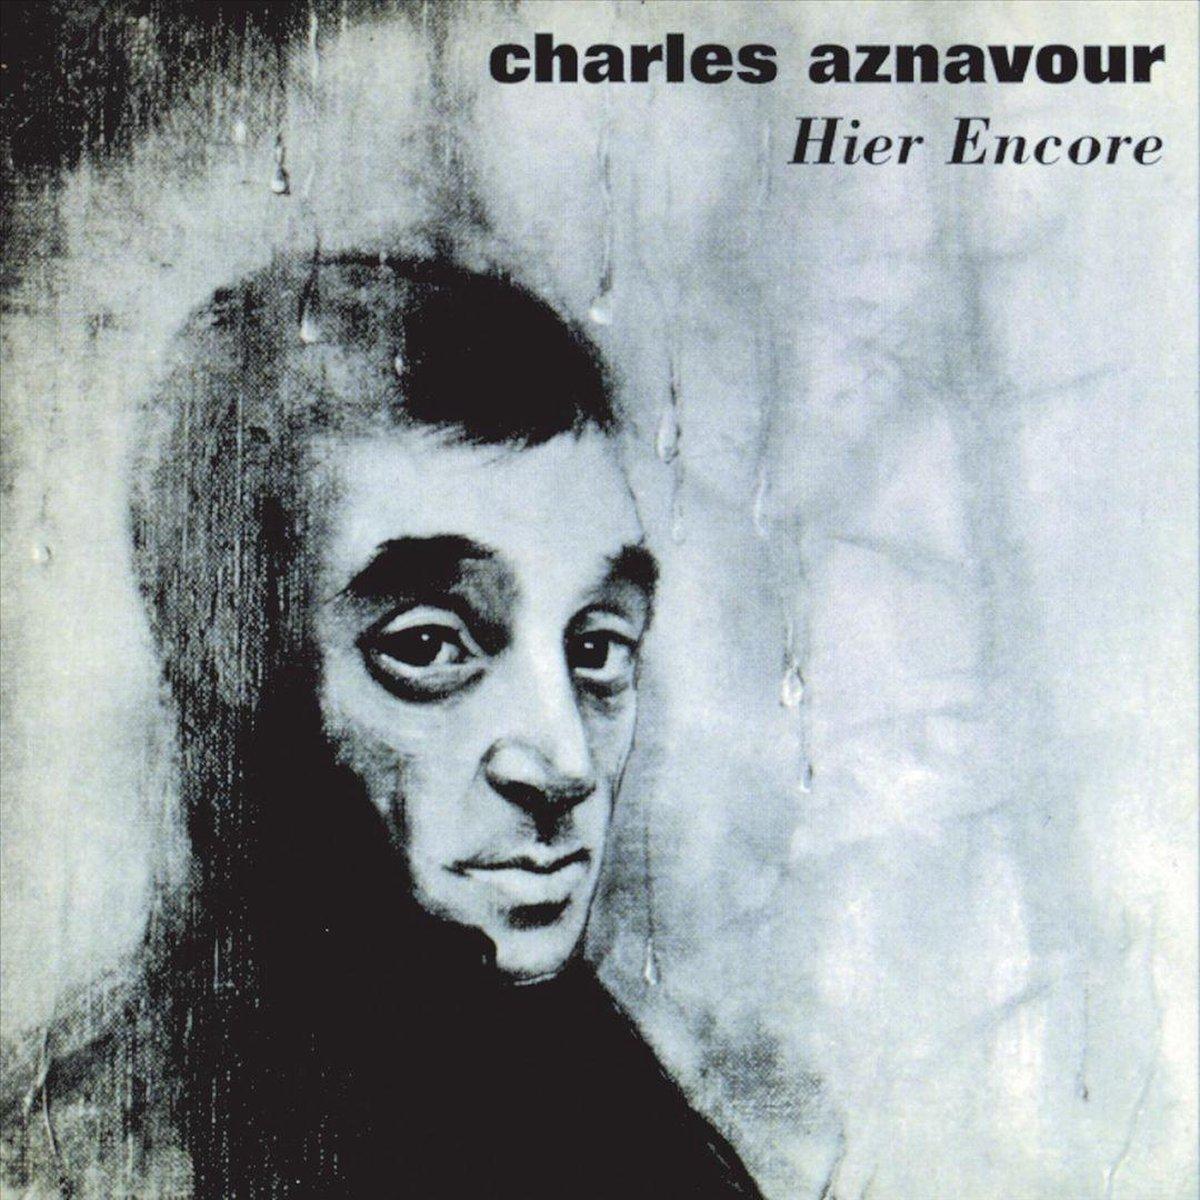 Hier Encore: Best of Studio et Live a L'Olympia - Charles Aznavour